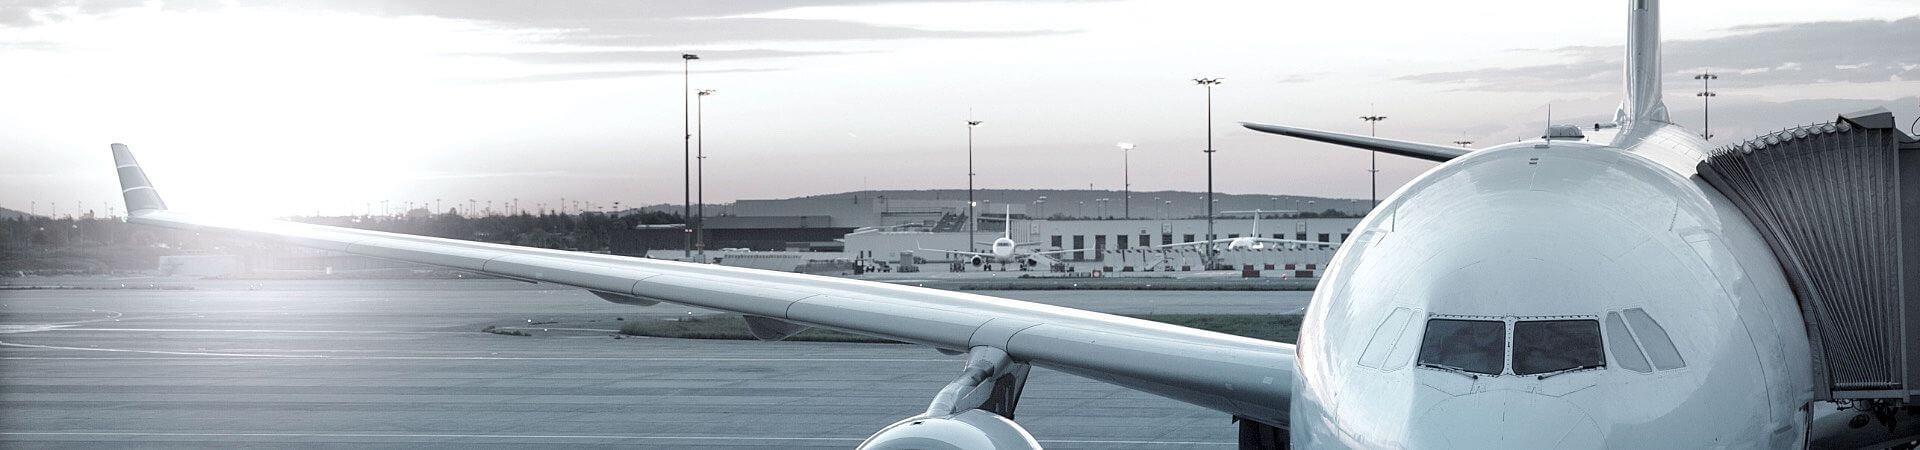 Parkende Flugzeuge am Flughafen - Aviation Power Group